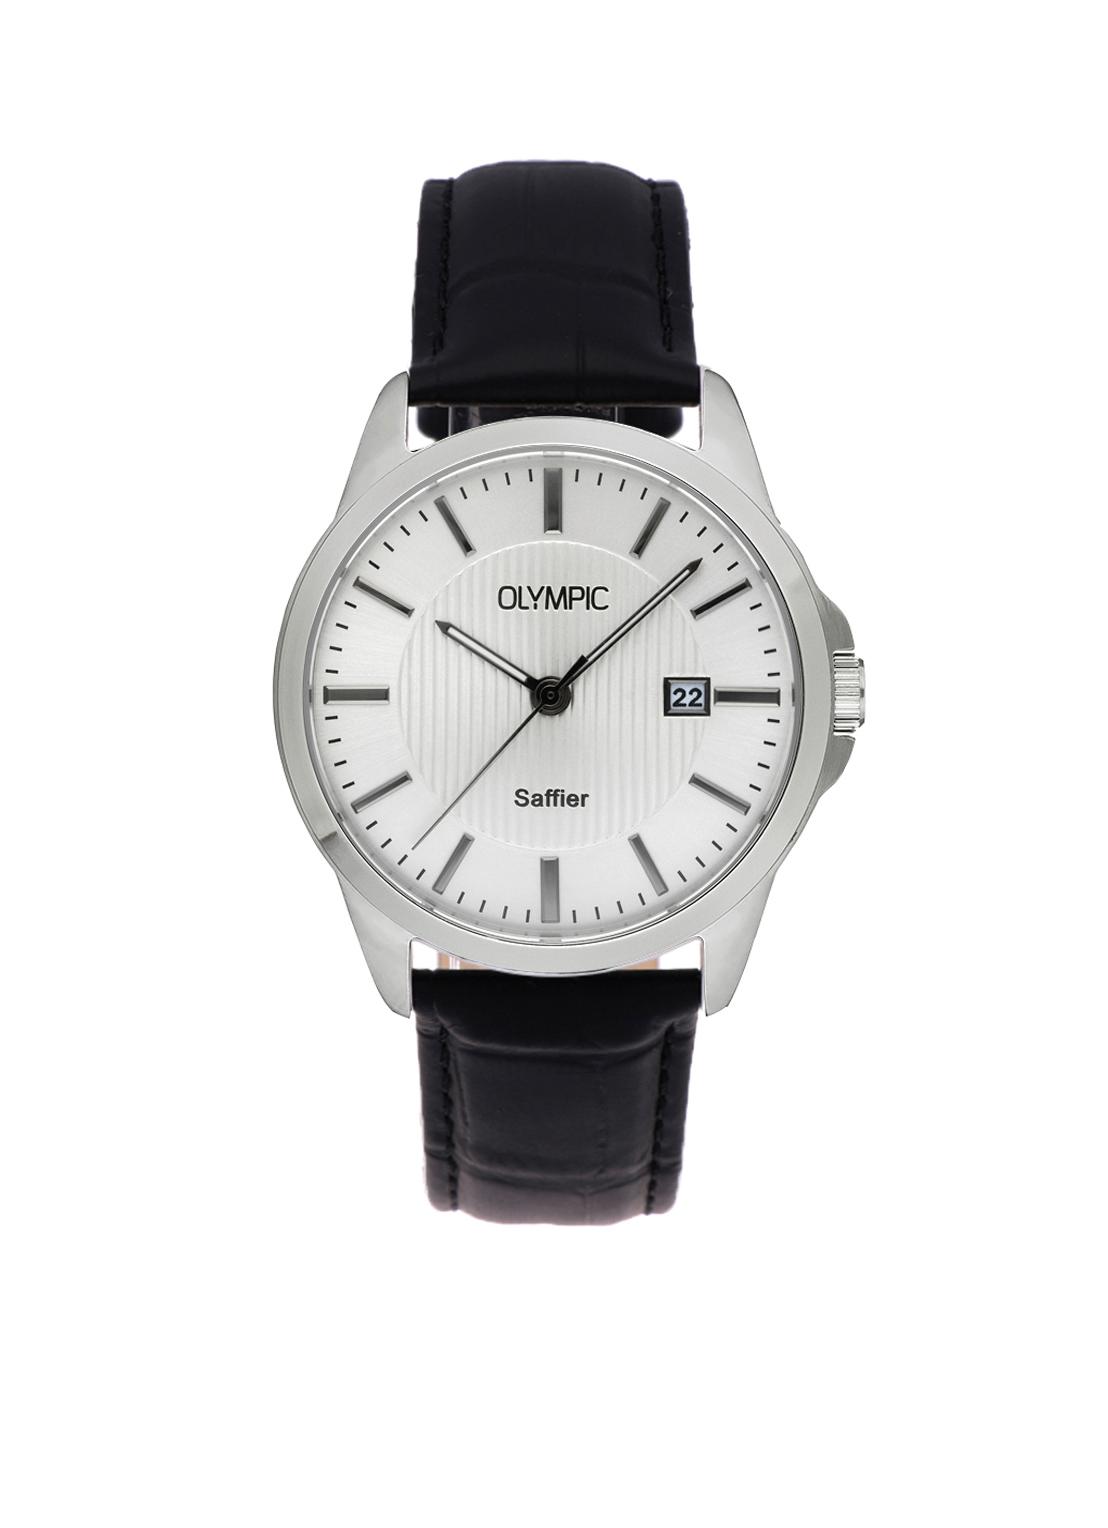 Olympic OL26HSL069 Bari Horloge Leer -Zwart- 39mm Heren